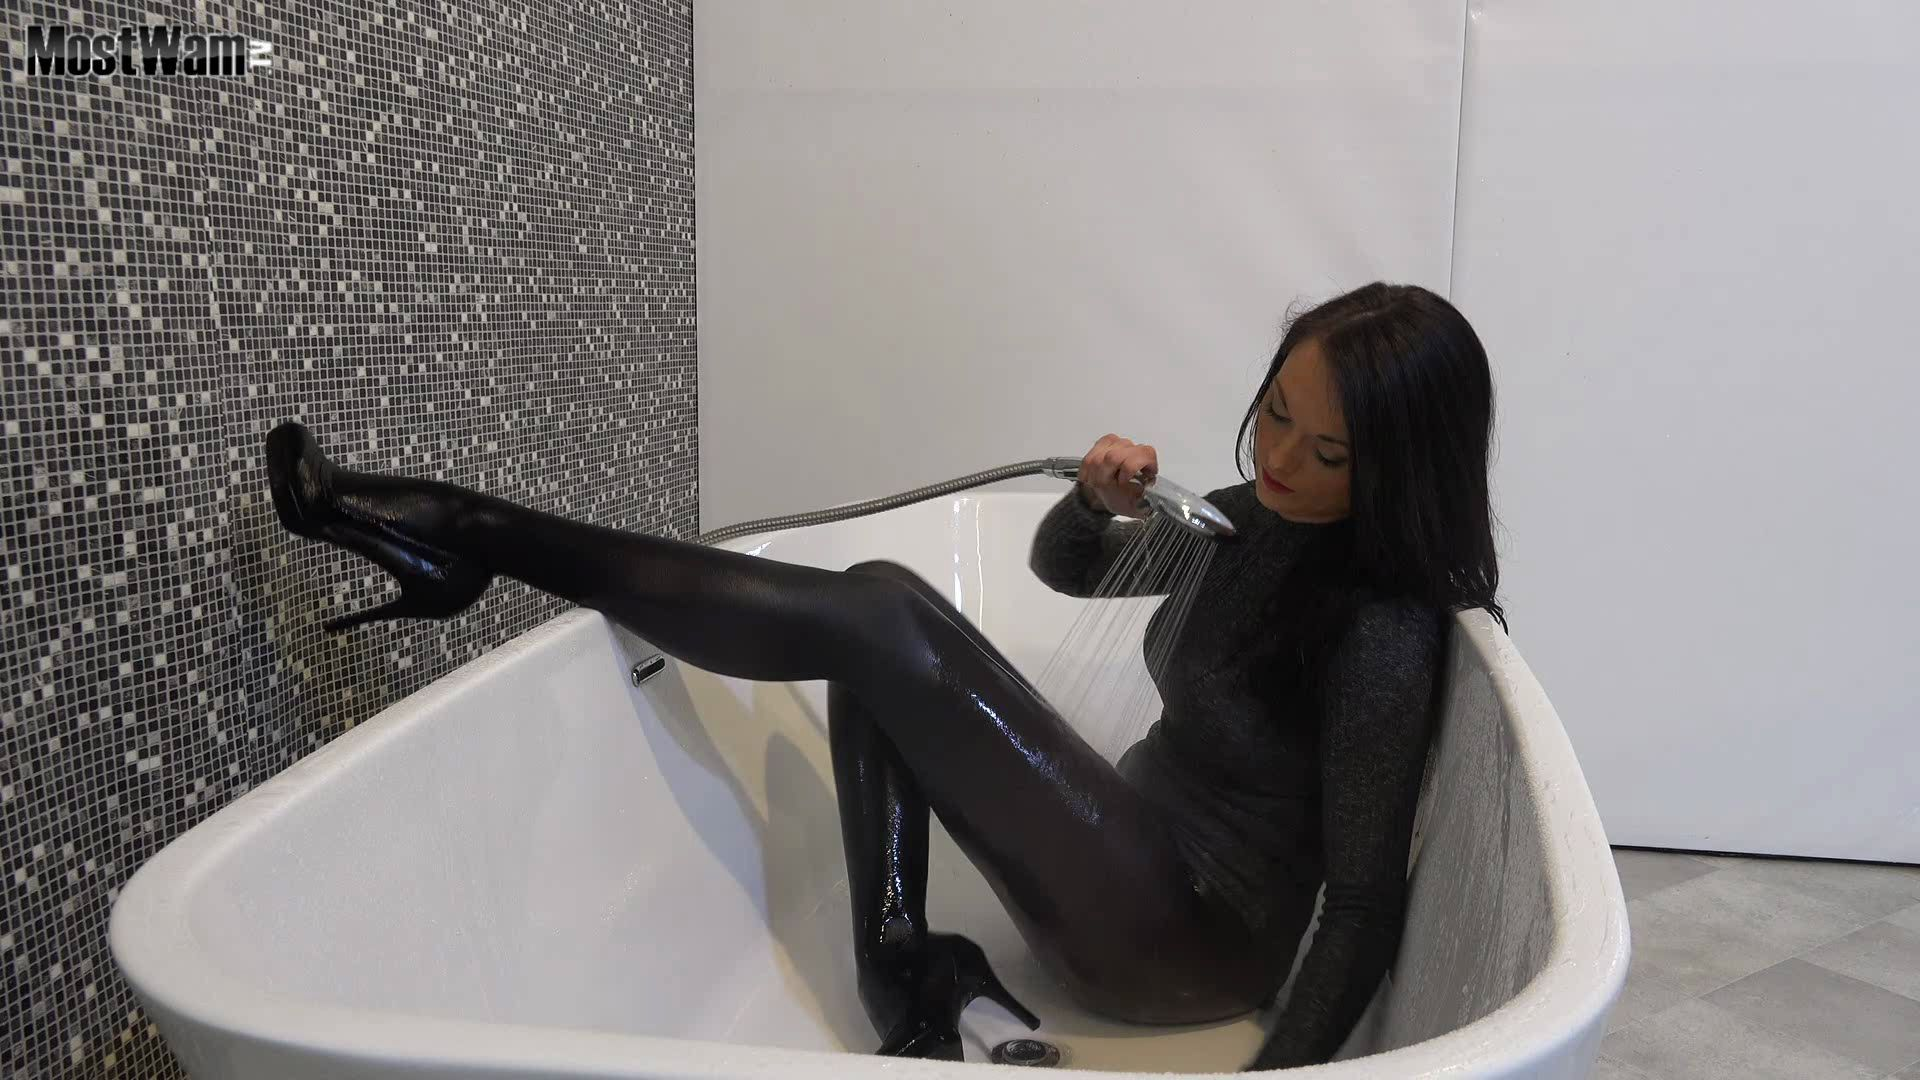 Pin by Sherleigh on bed n bath   Mirror selfie, Girly